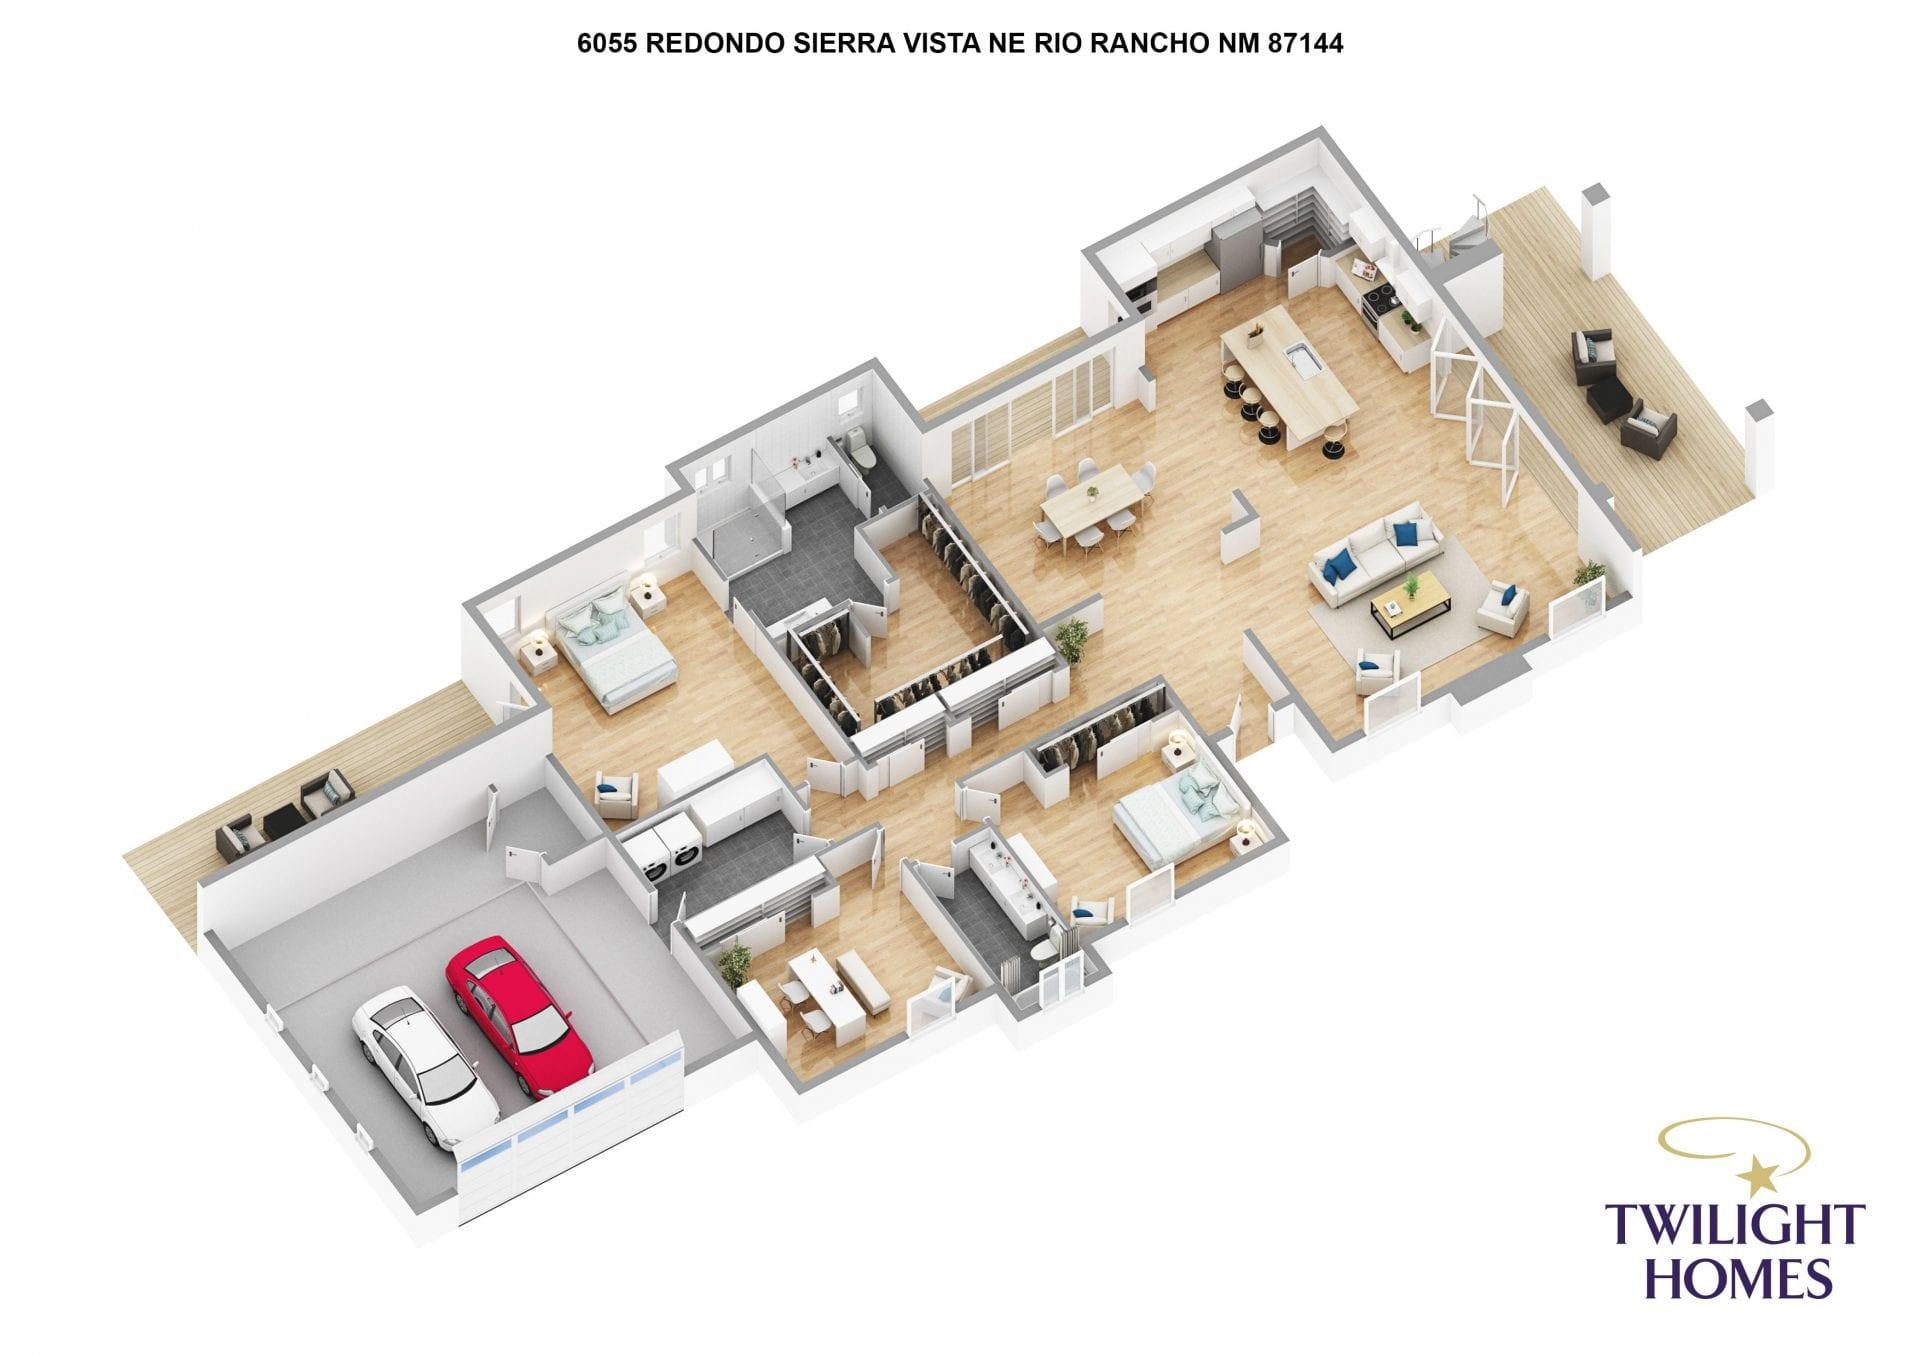 Twilight-homes-the-geneva-floorplan